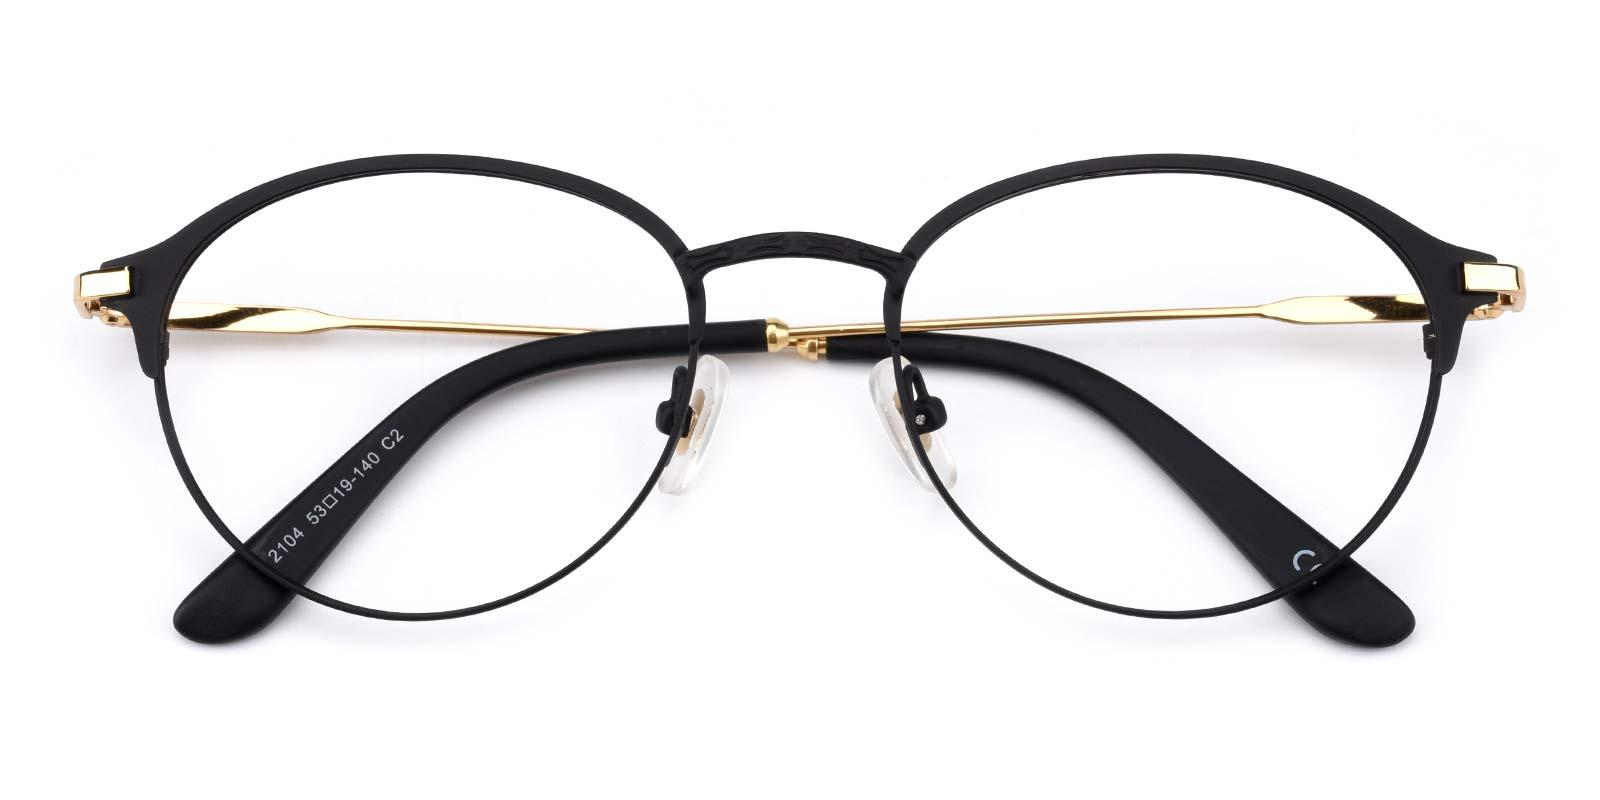 Jean-Black-Round-Metal-Eyeglasses-detail